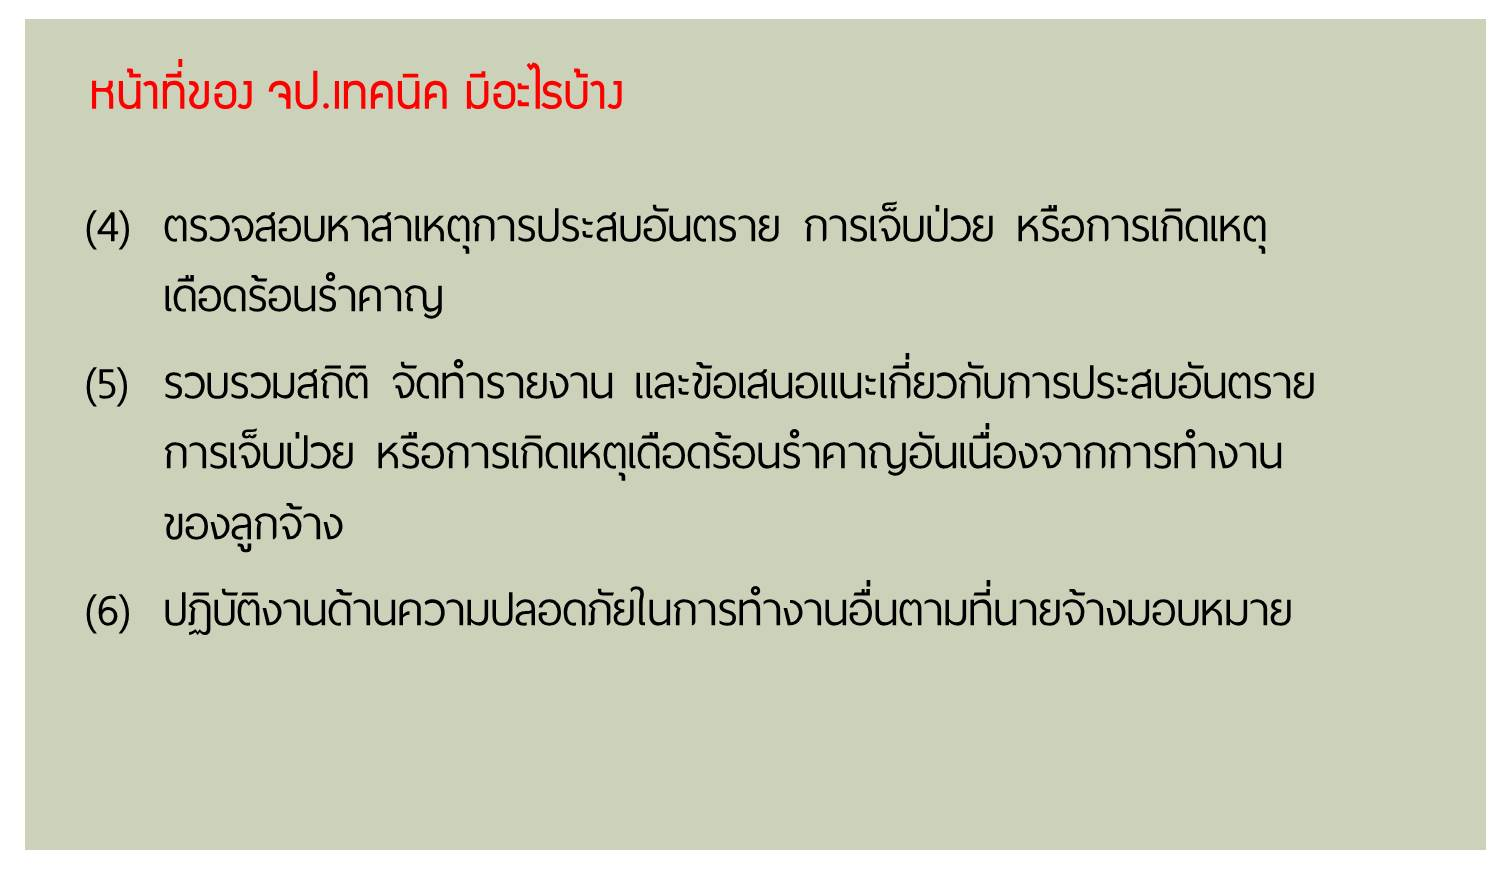 jpt (4)